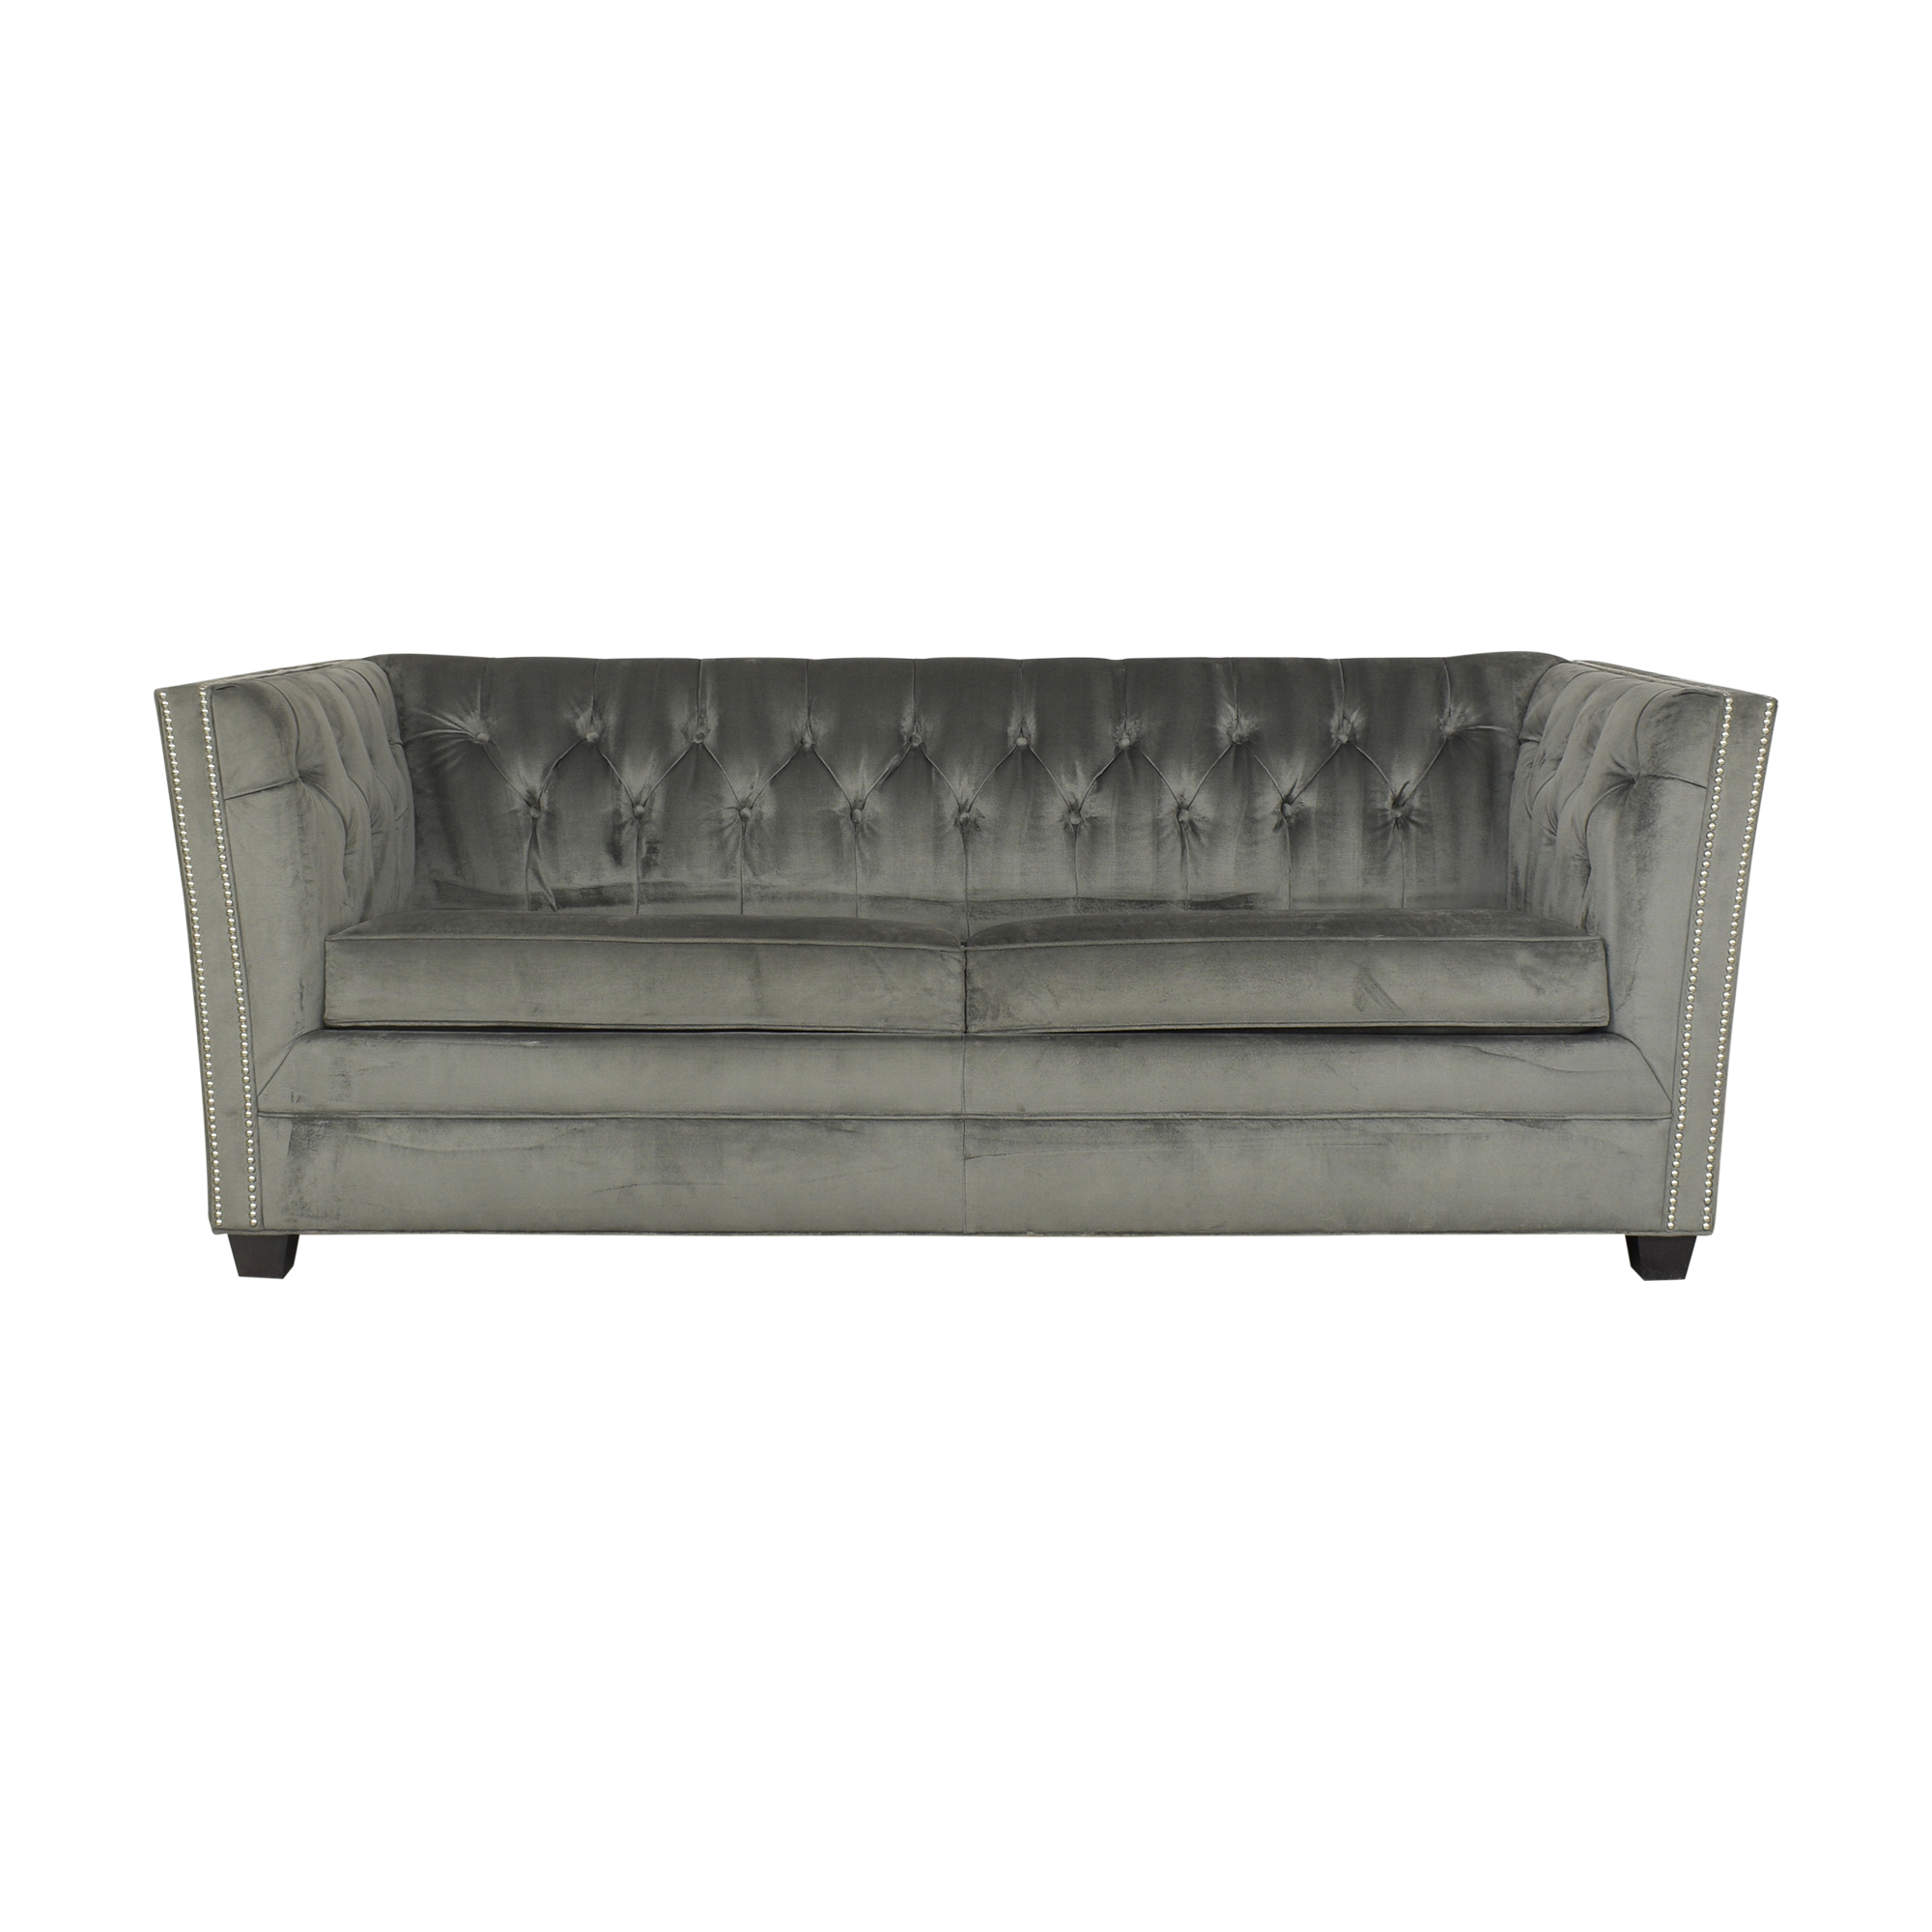 Mitchell Gold + Bob Williams Mitchell Gold + Bob Williams Super Luxe Sleeper Sofa dimensions